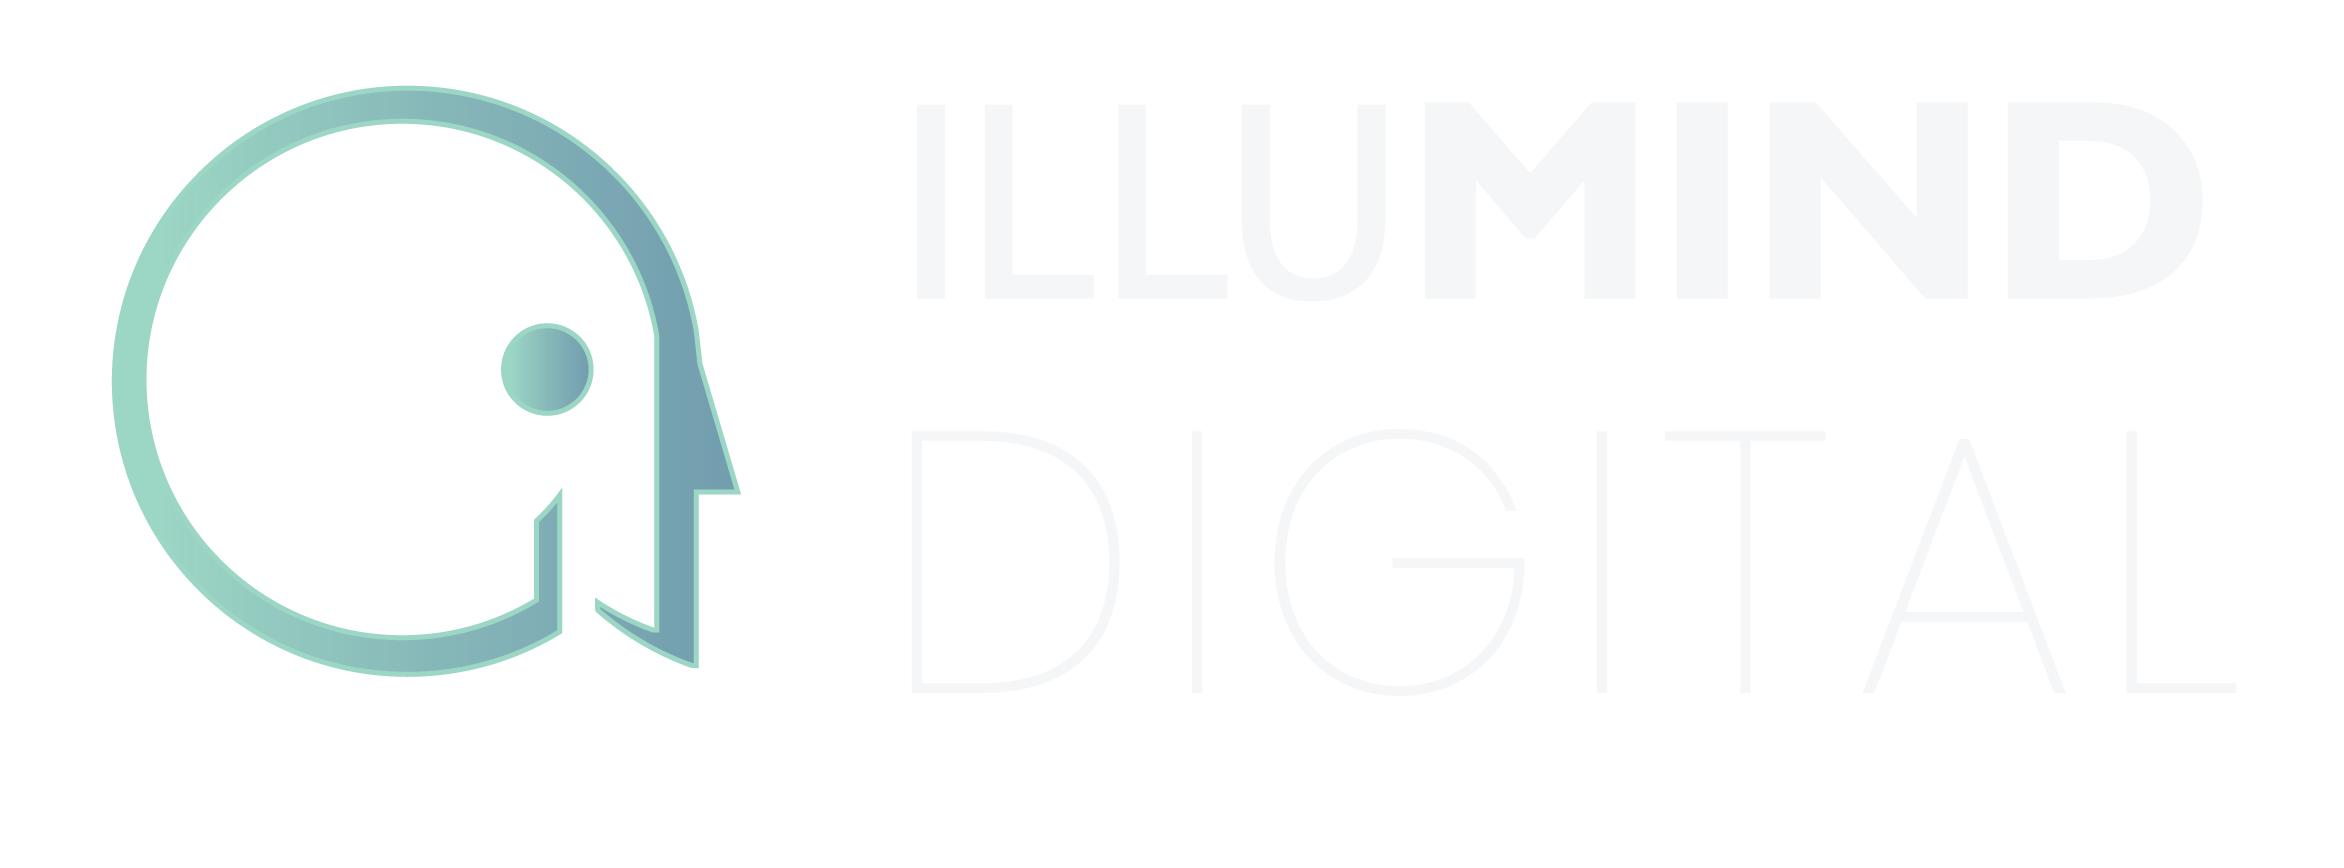 Illumind Digital